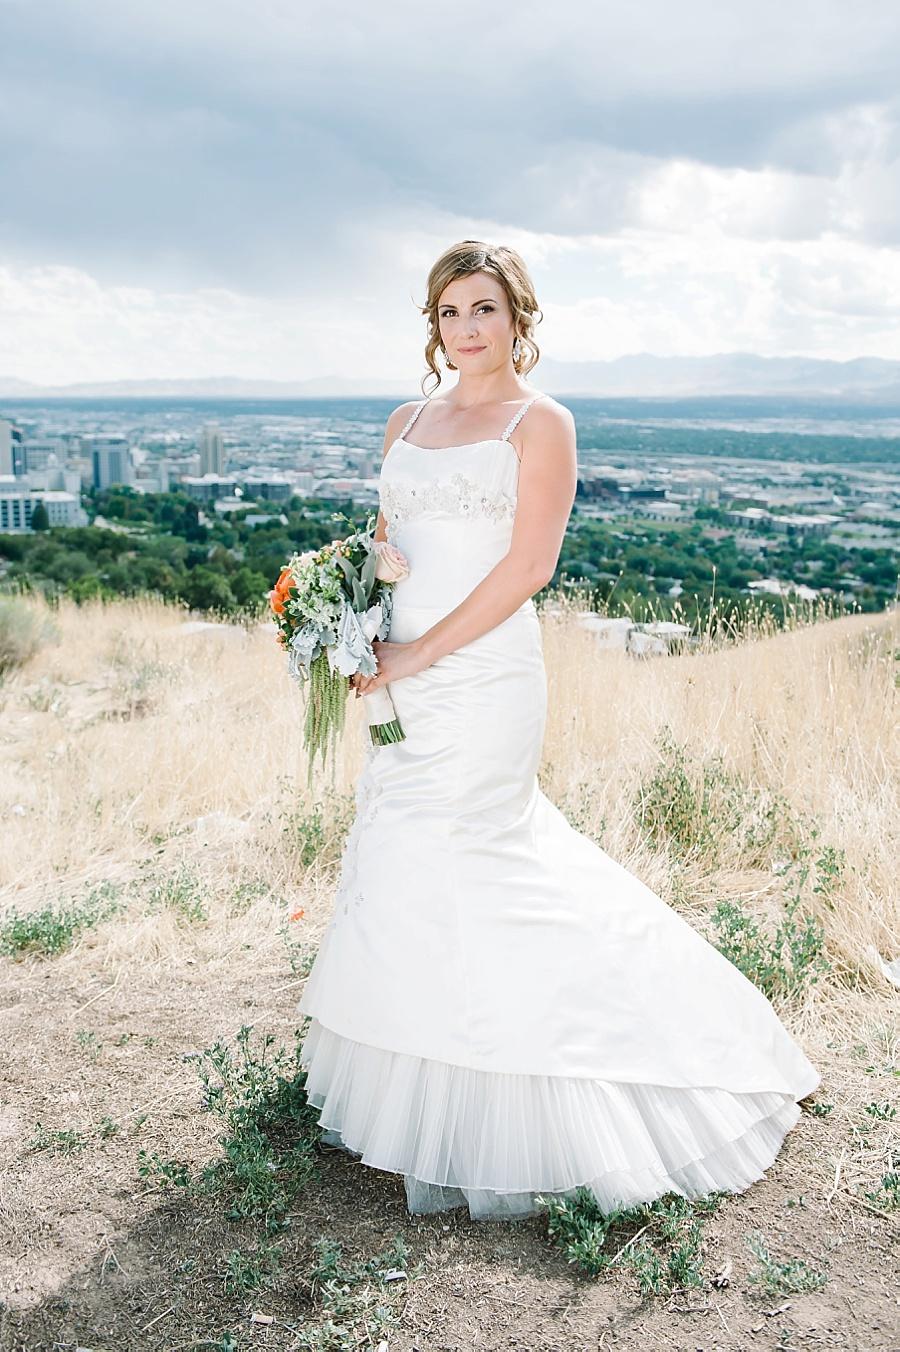 SLC Wedding Photographer Ali Sumsion 1105